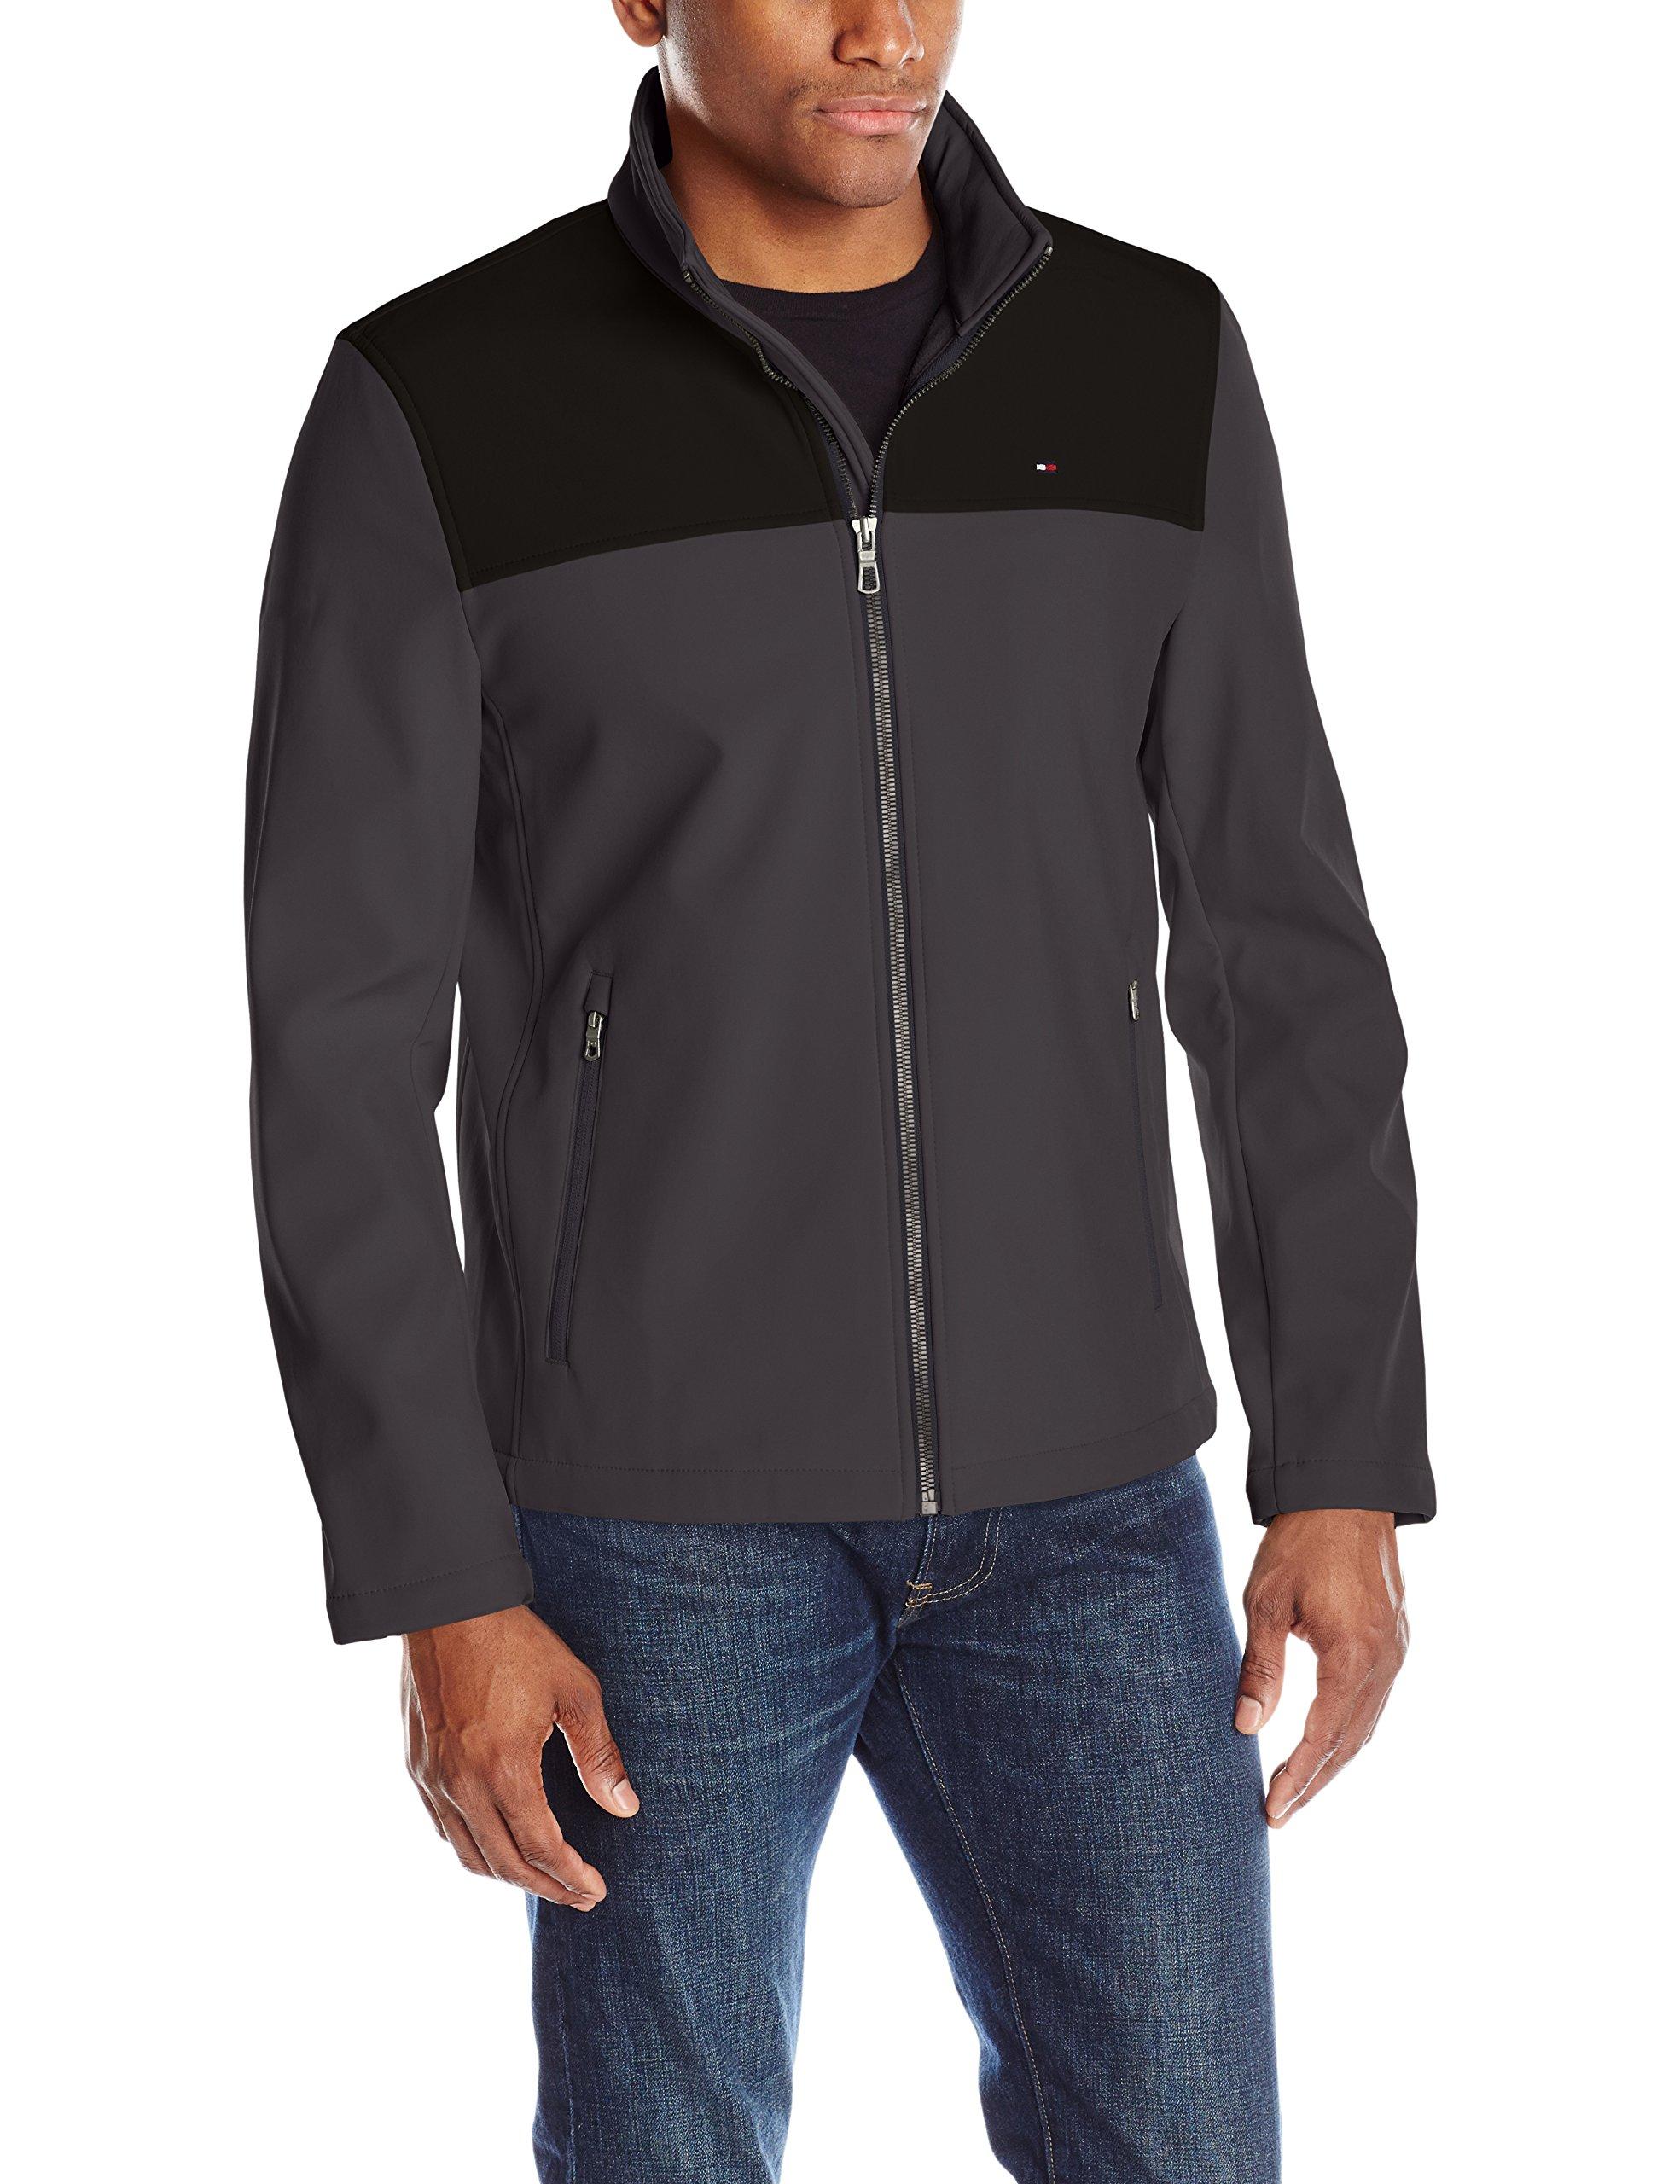 Tommy Hilfiger Men's Classic Soft Shell Jacket (Regular & Big-Tall Sizes), charcoal/black, Medium by Tommy Hilfiger